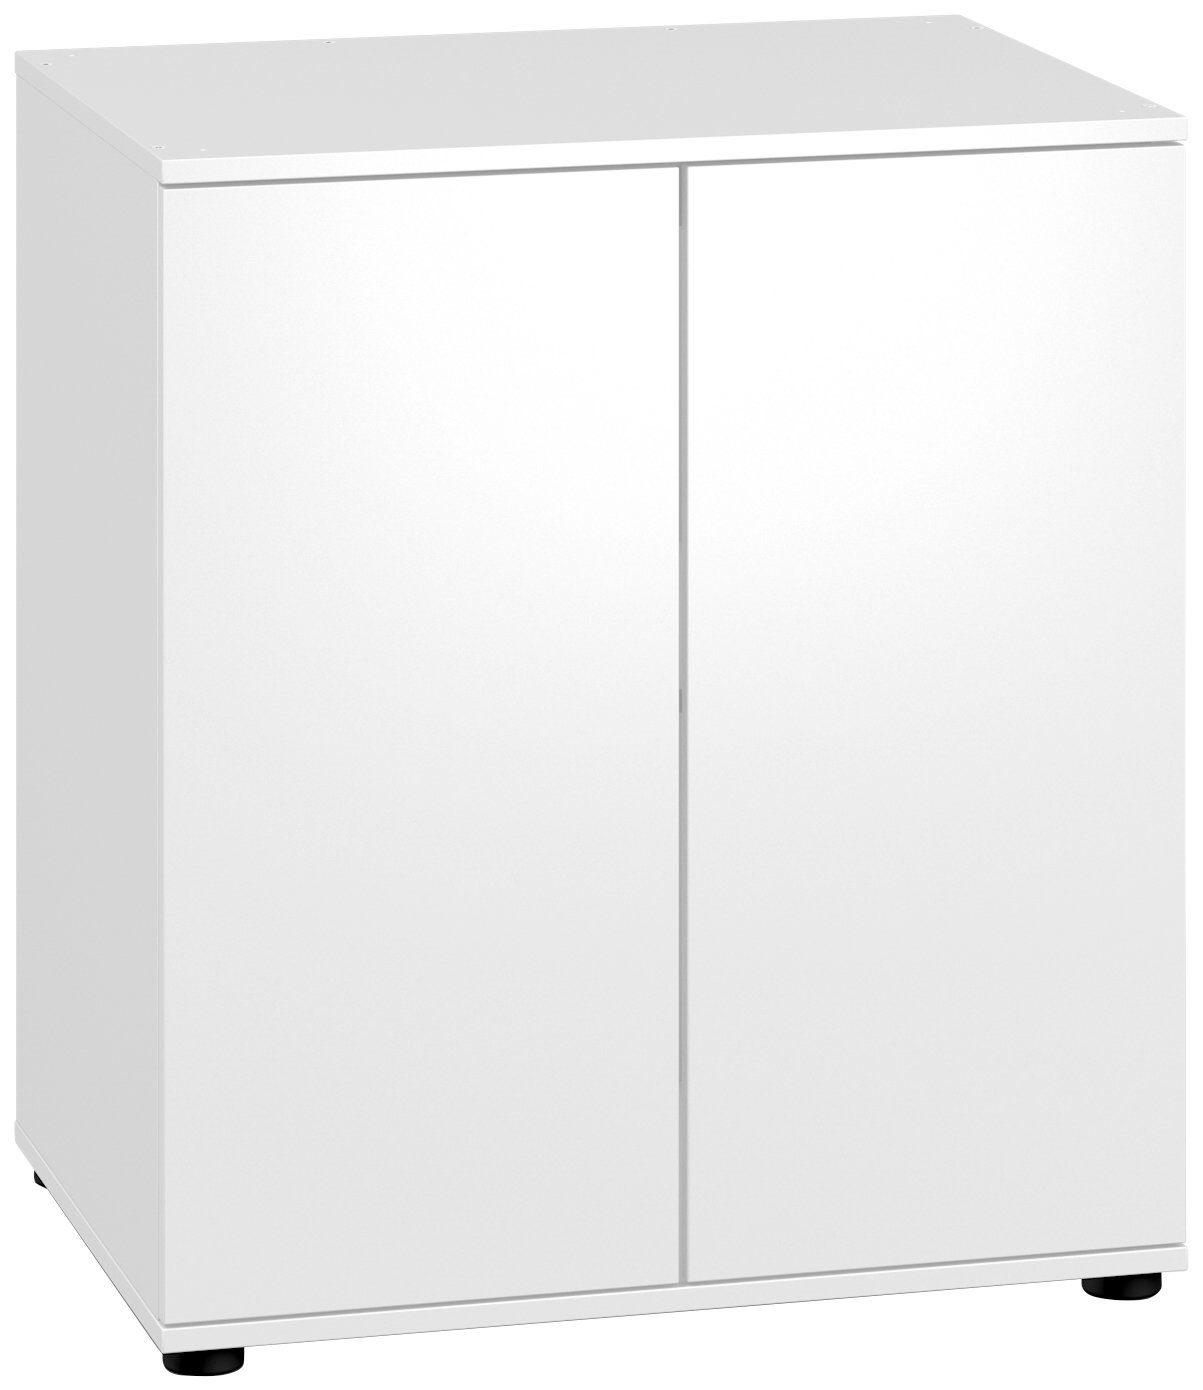 Aquarien-Unterschrank »SBX Lido 200«, BxTxH: 71x51x80 cm, weiß